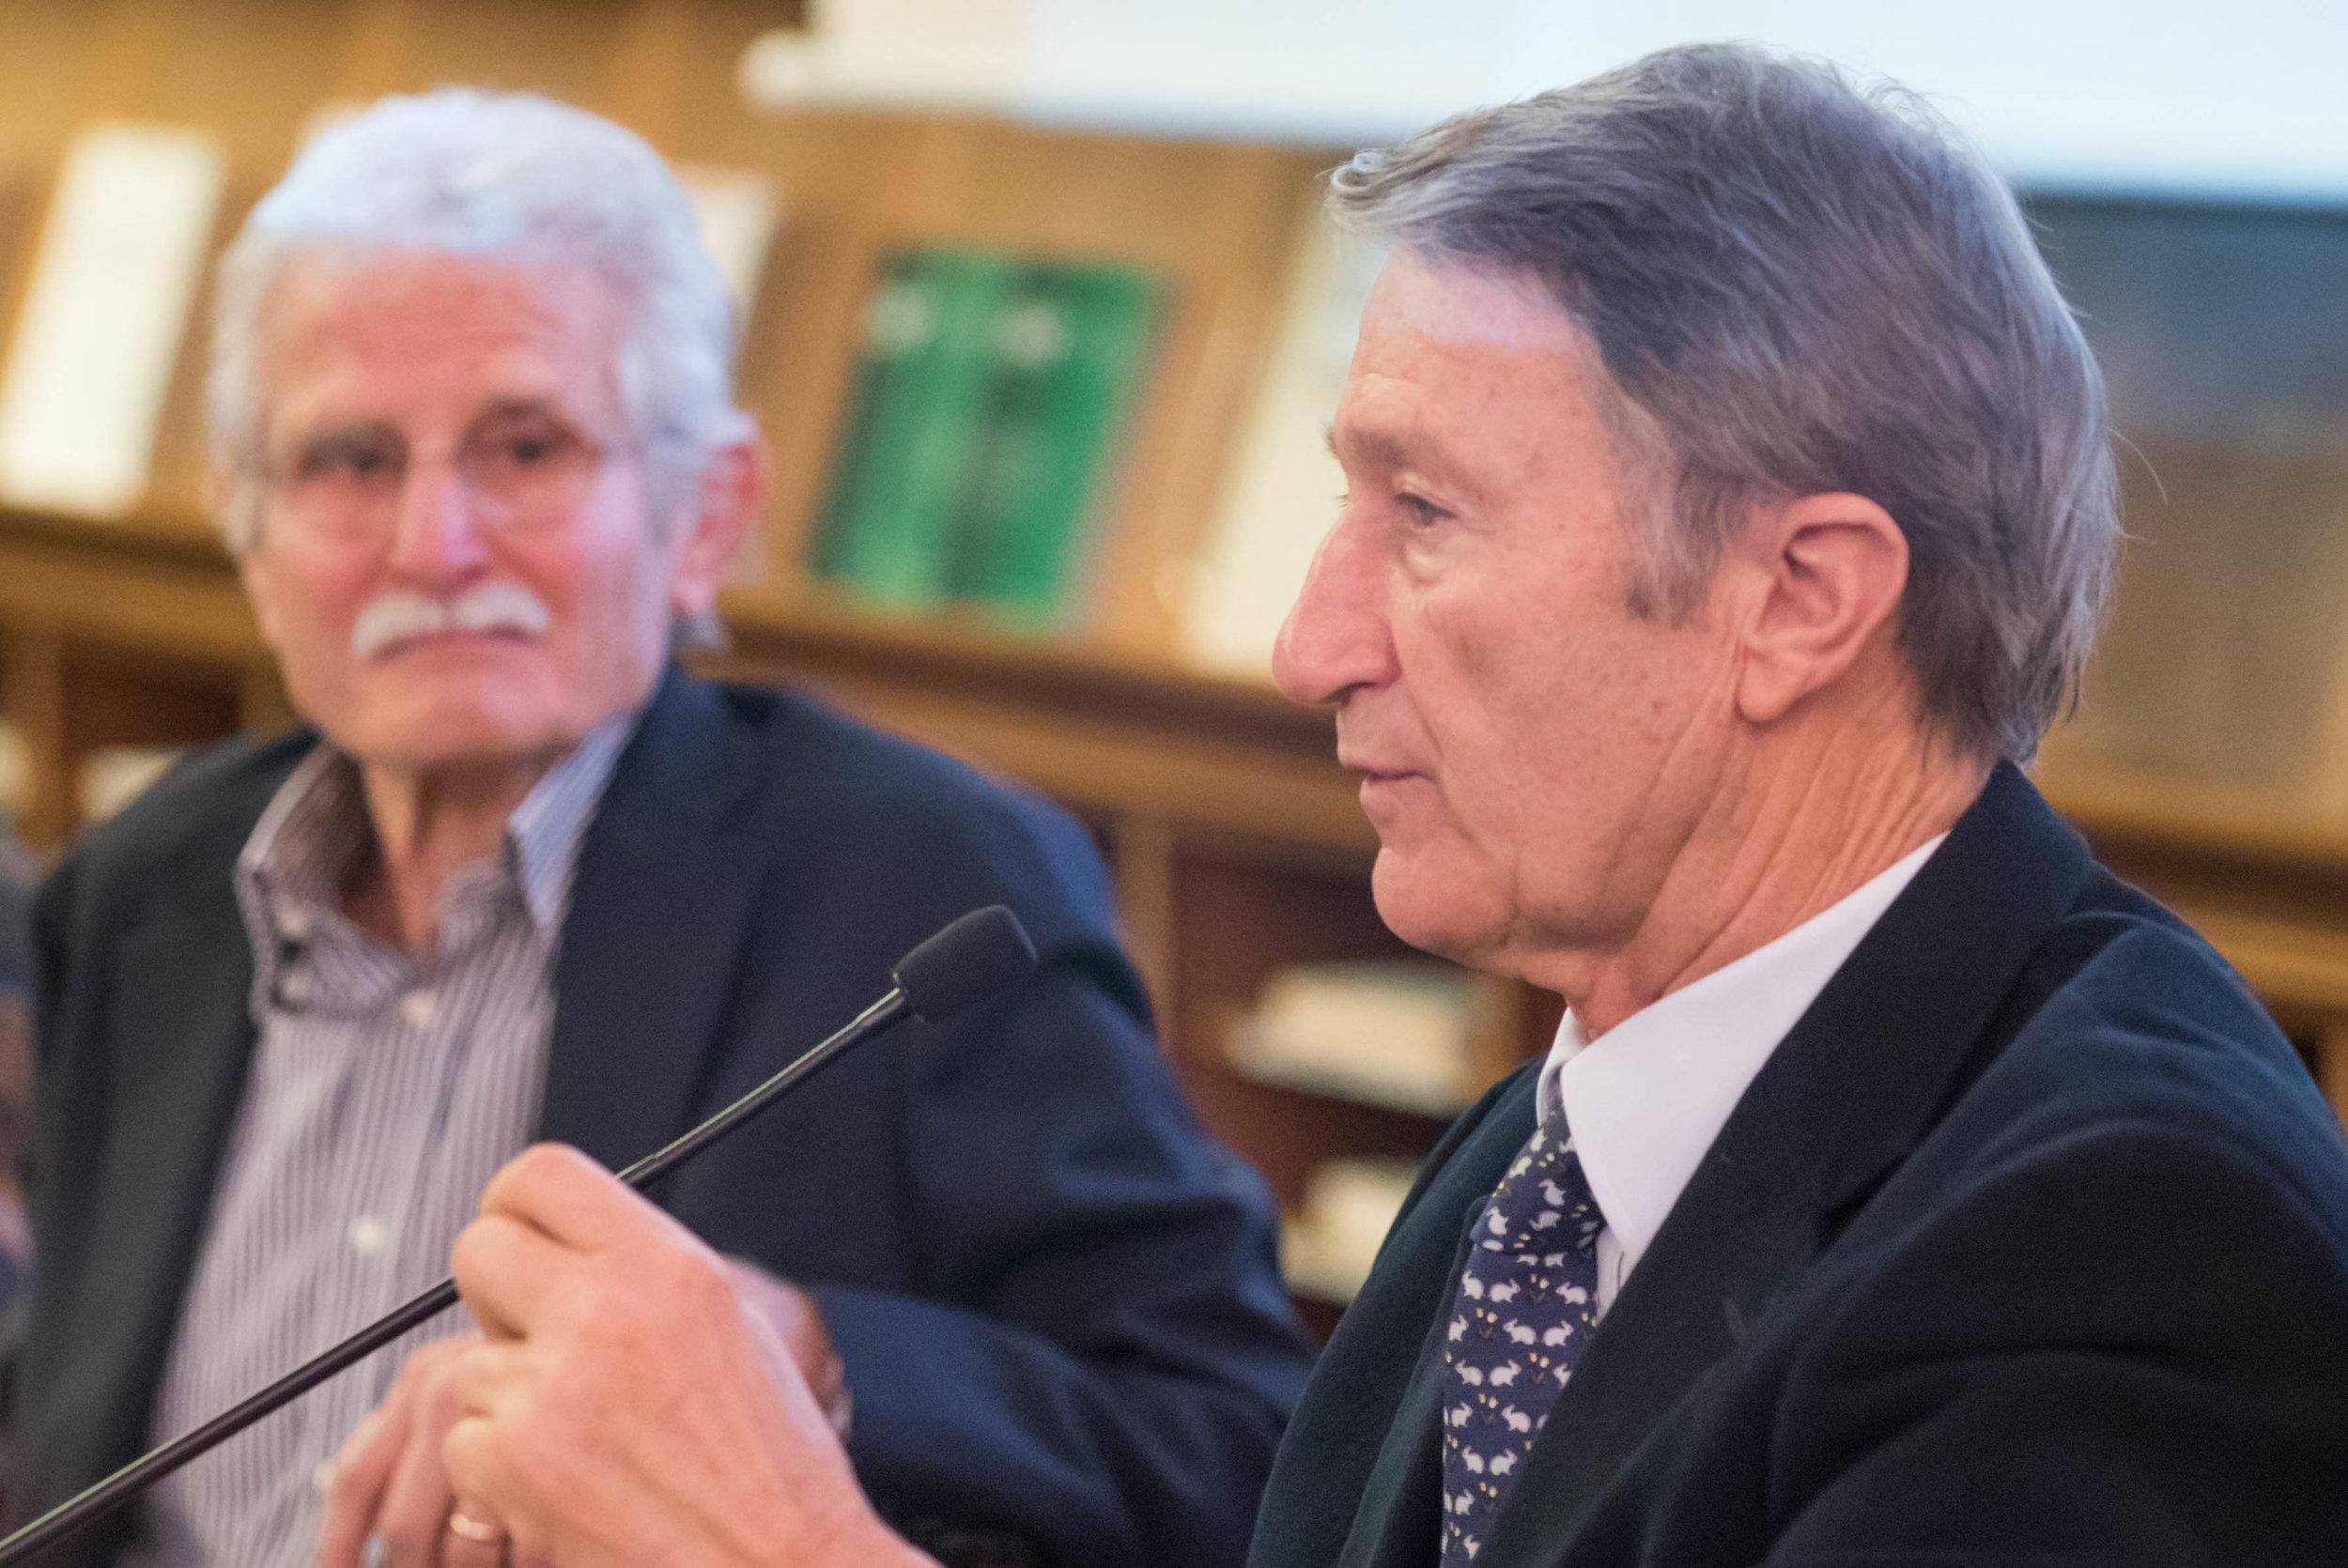 2018 02 08 Giardino dei Giusti - Guido Rivoir - Conferenza Lugano-00316.jpg